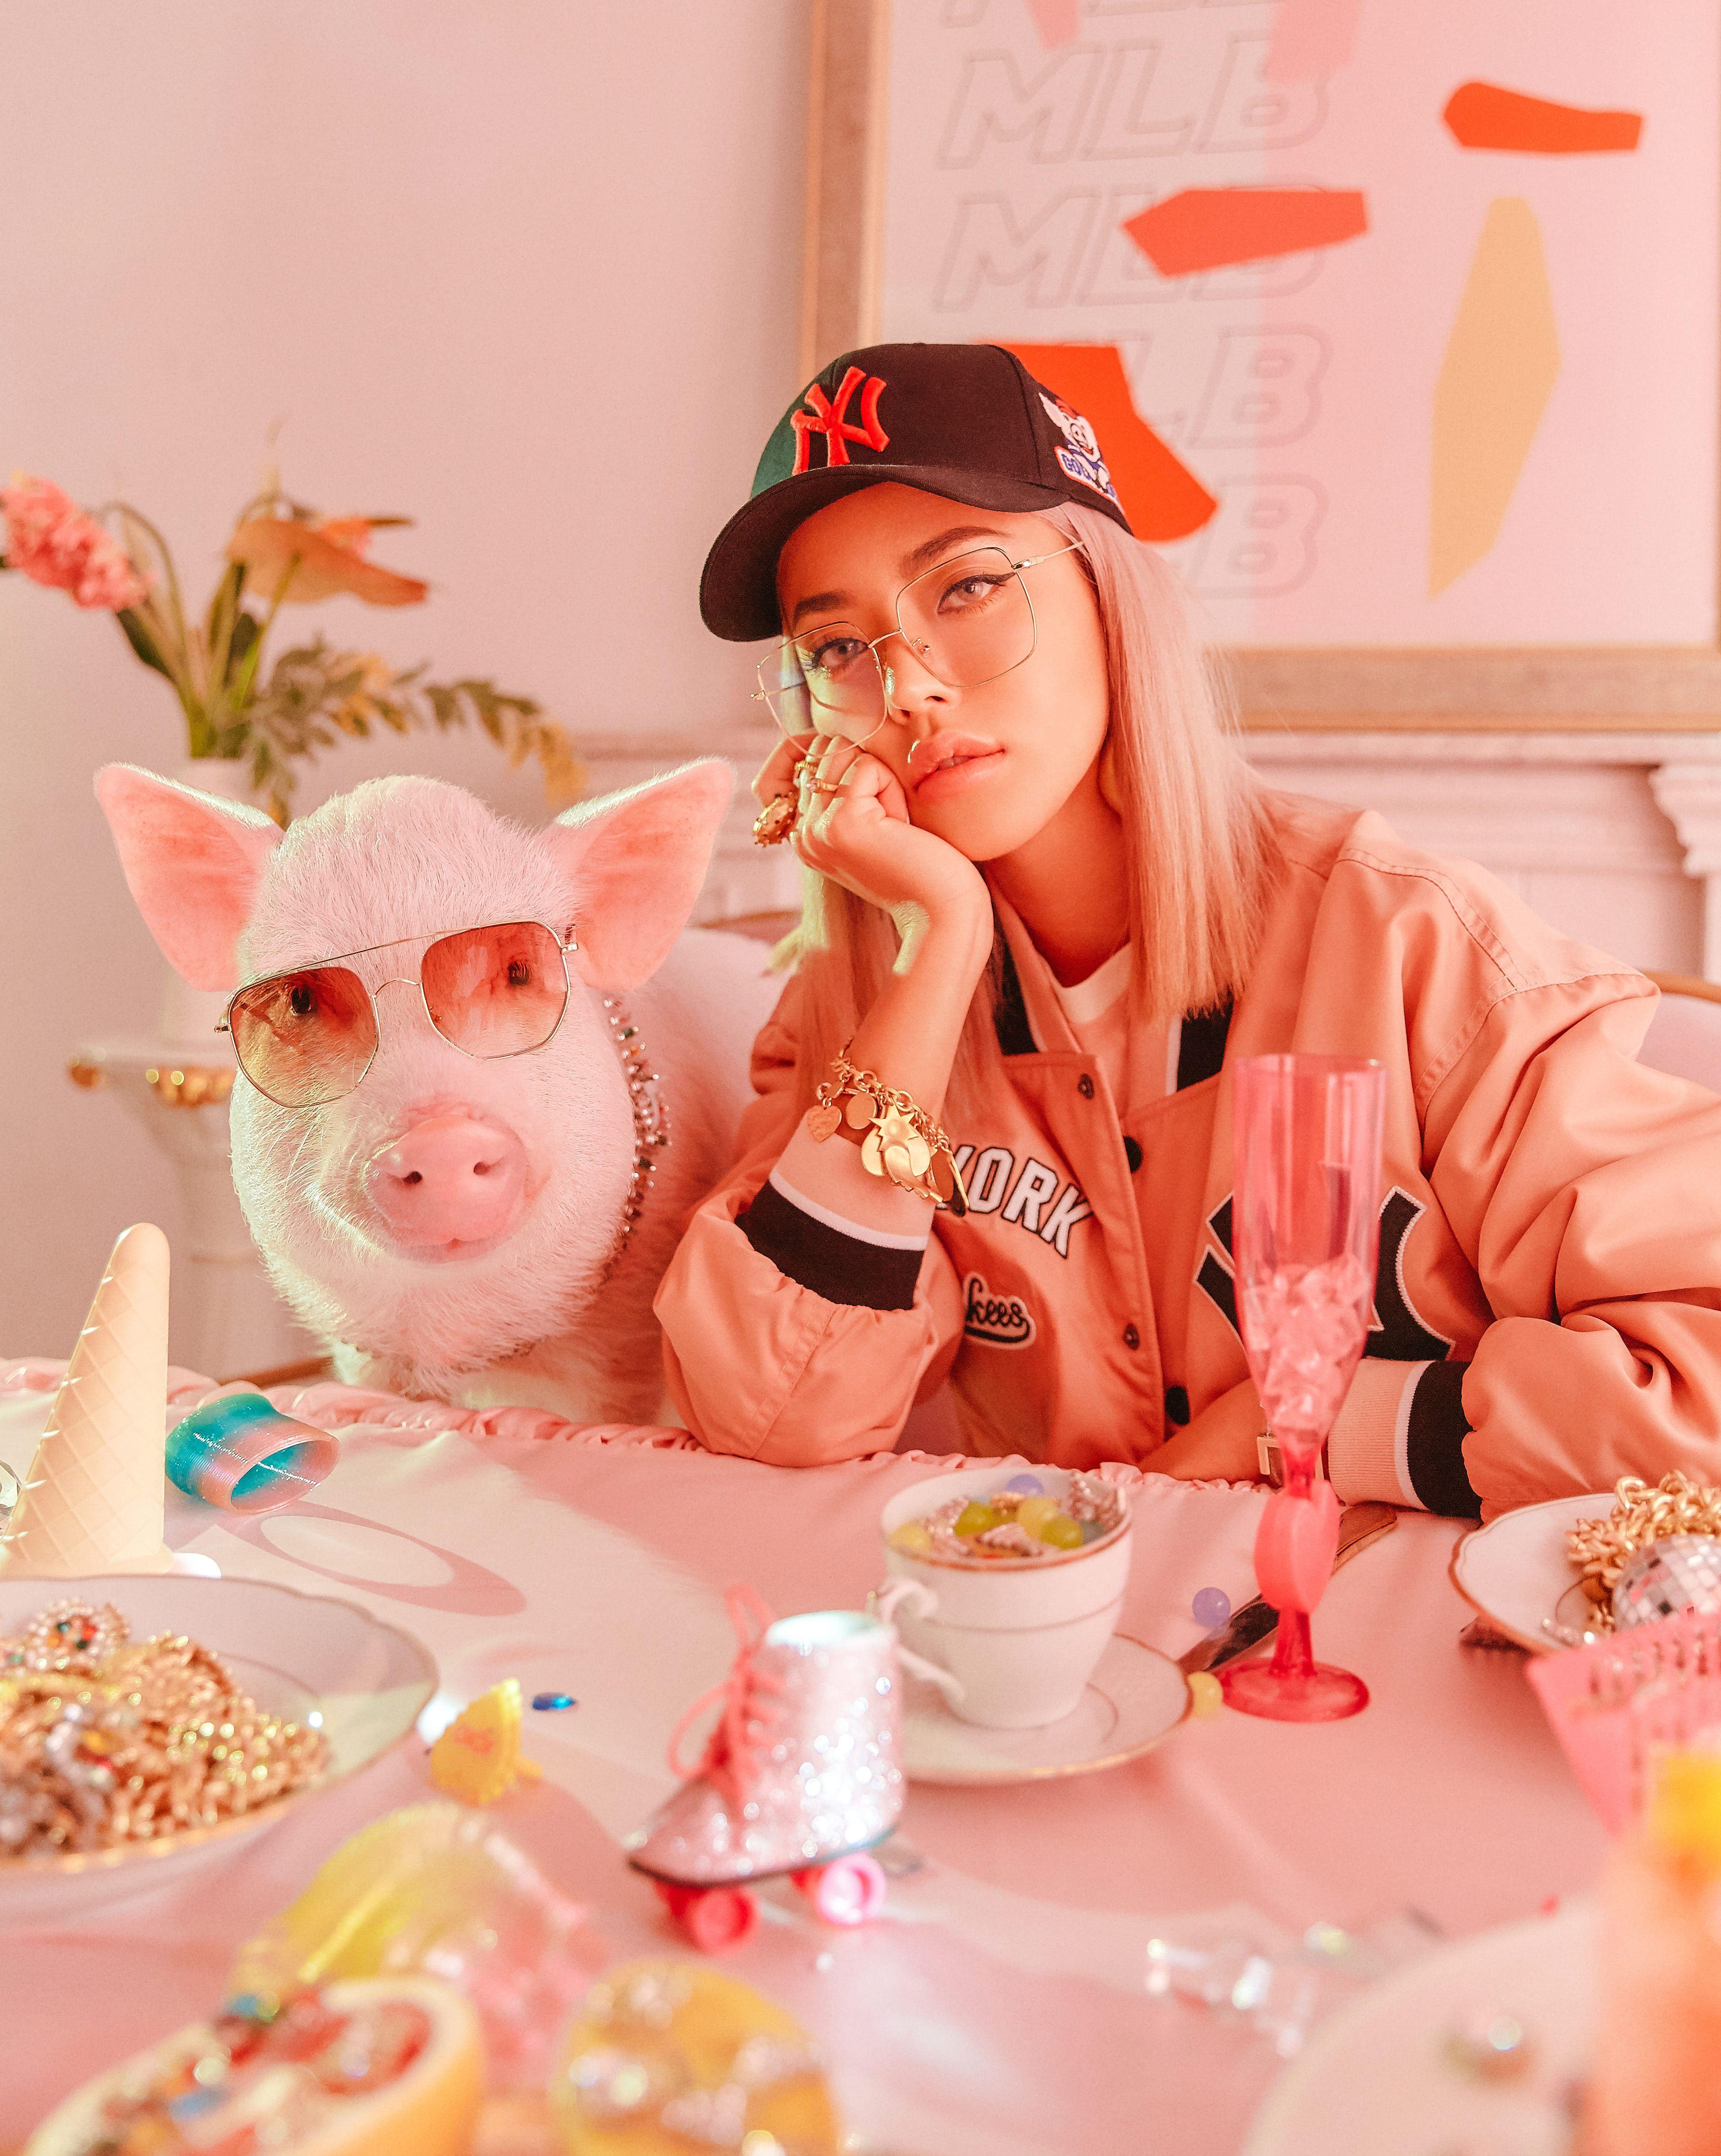 Lucky Pig, MLB, MLB Korea, cap, 潮帽, 衛衣, 豬年時尚單品, 豬年系列, 韓國潮牌